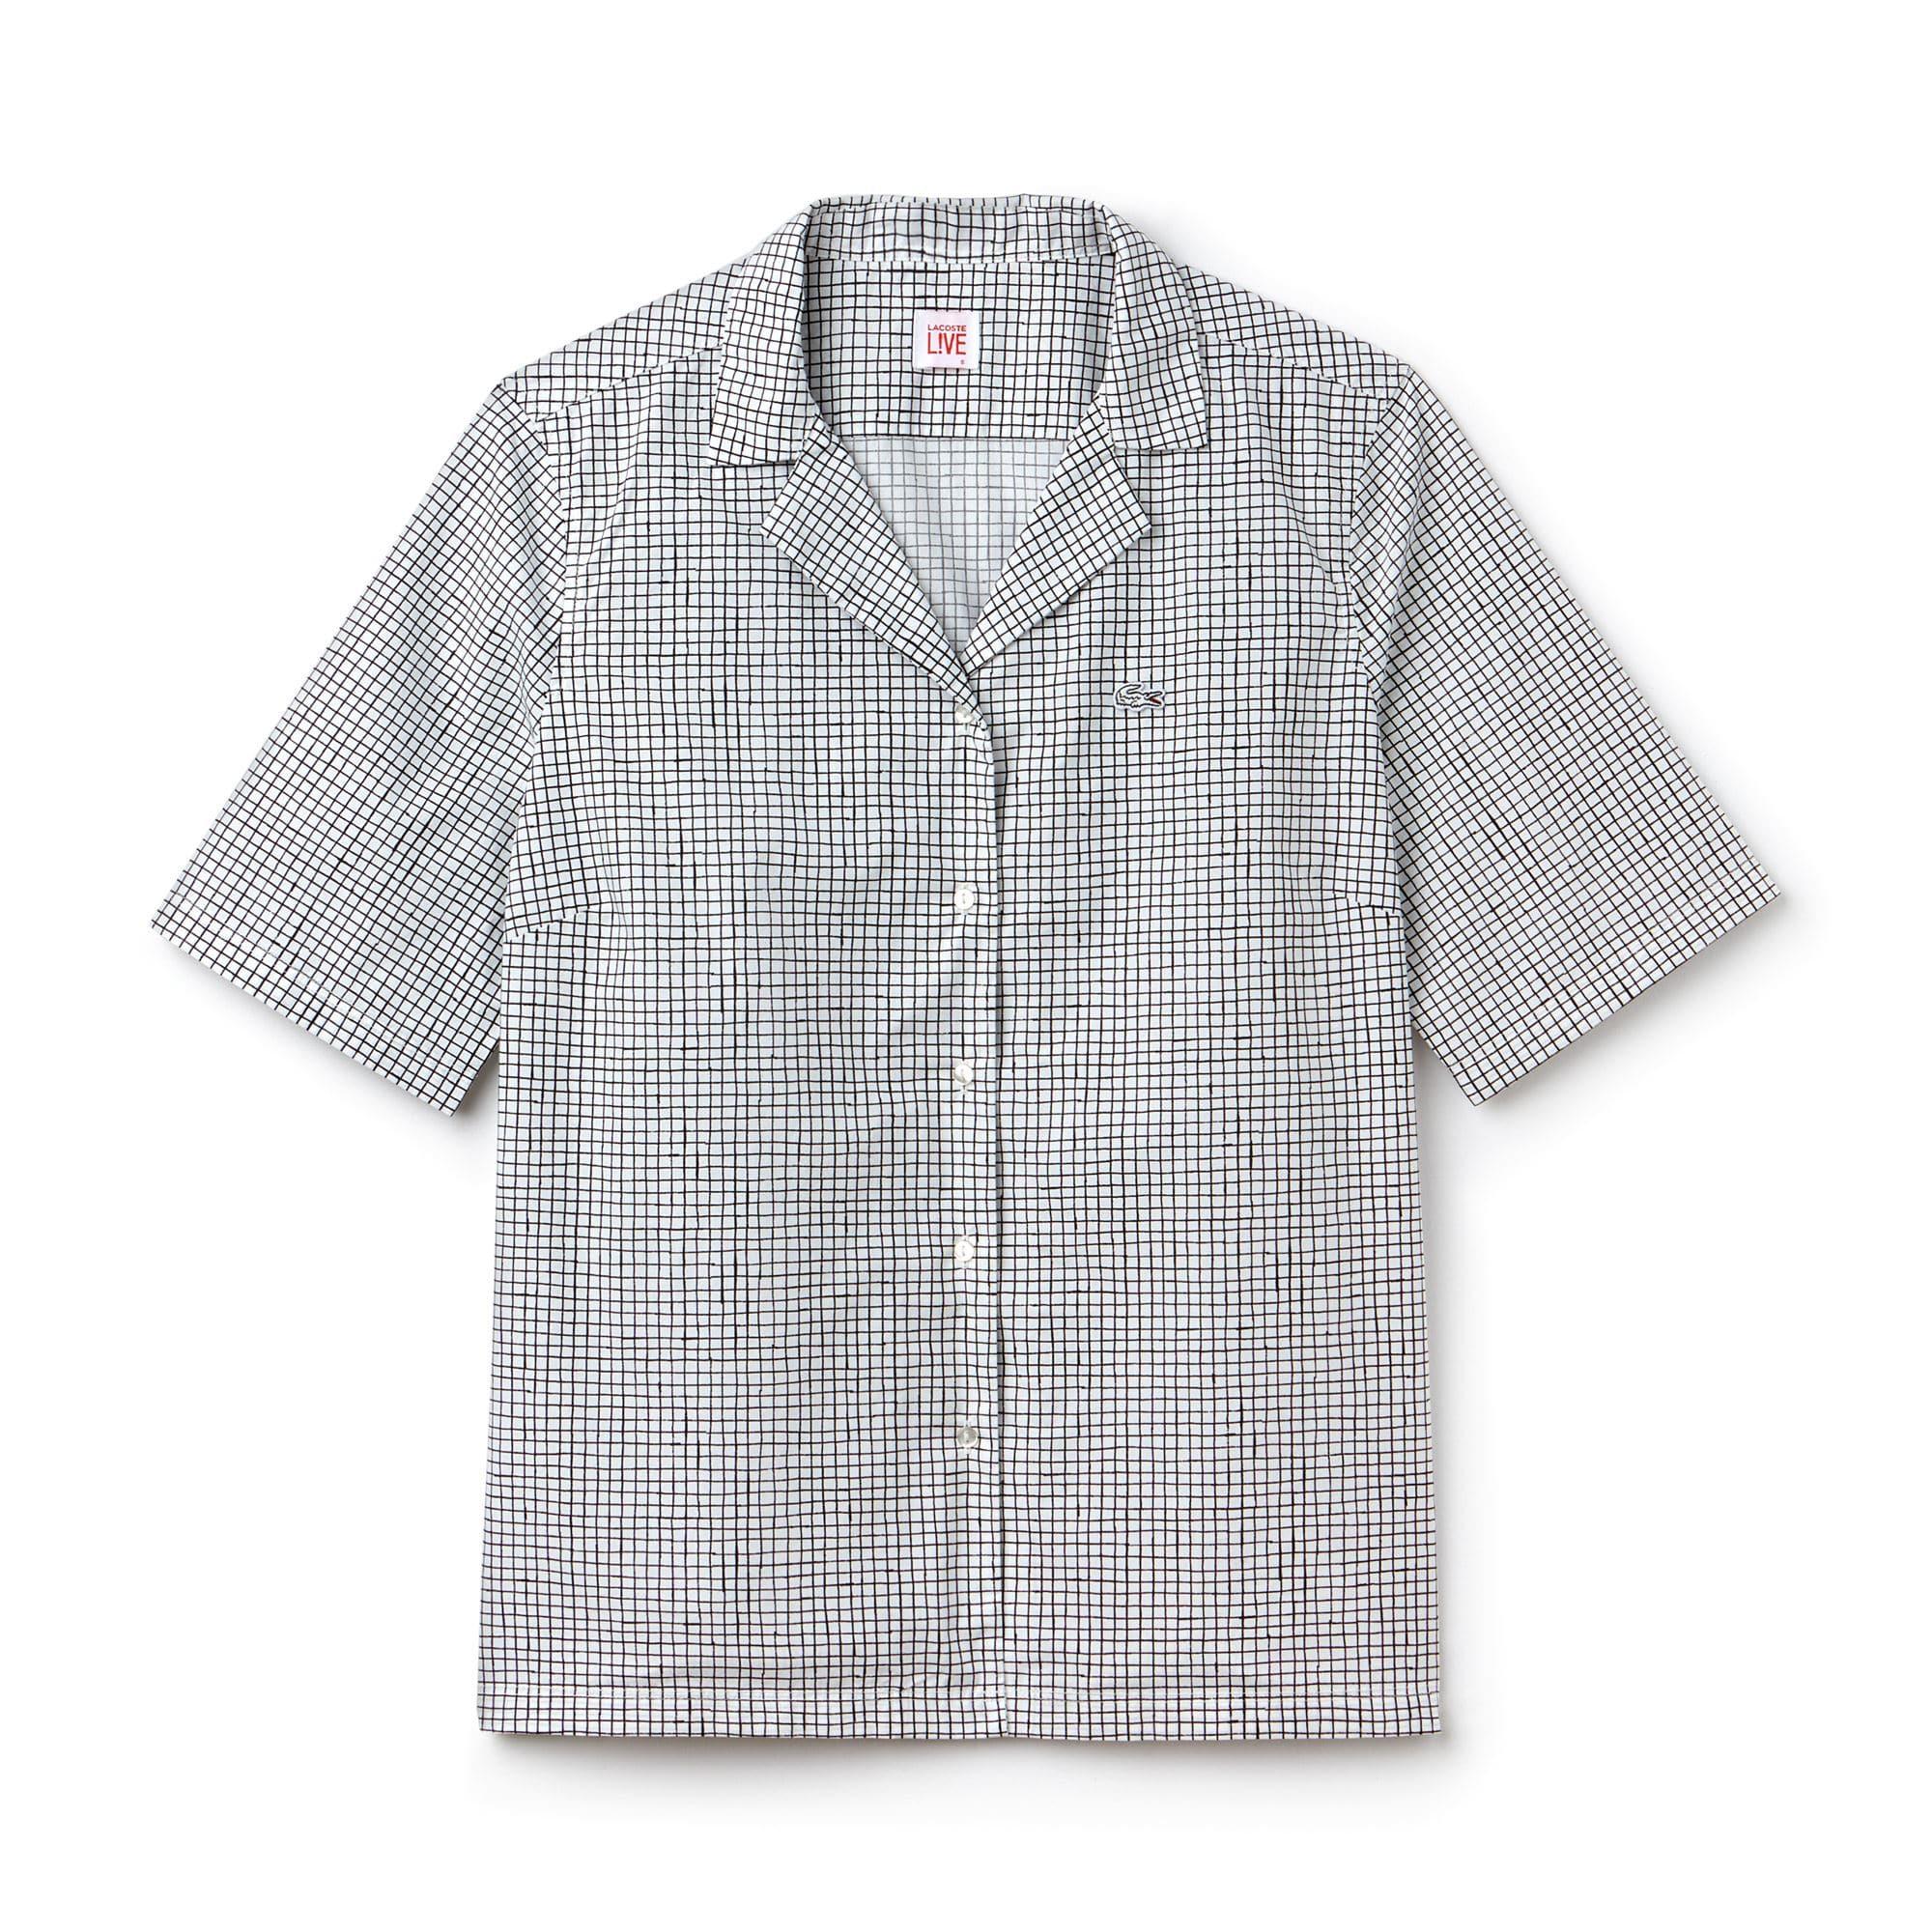 Camisa Lacoste LIVE de manga corta de popelín estampado